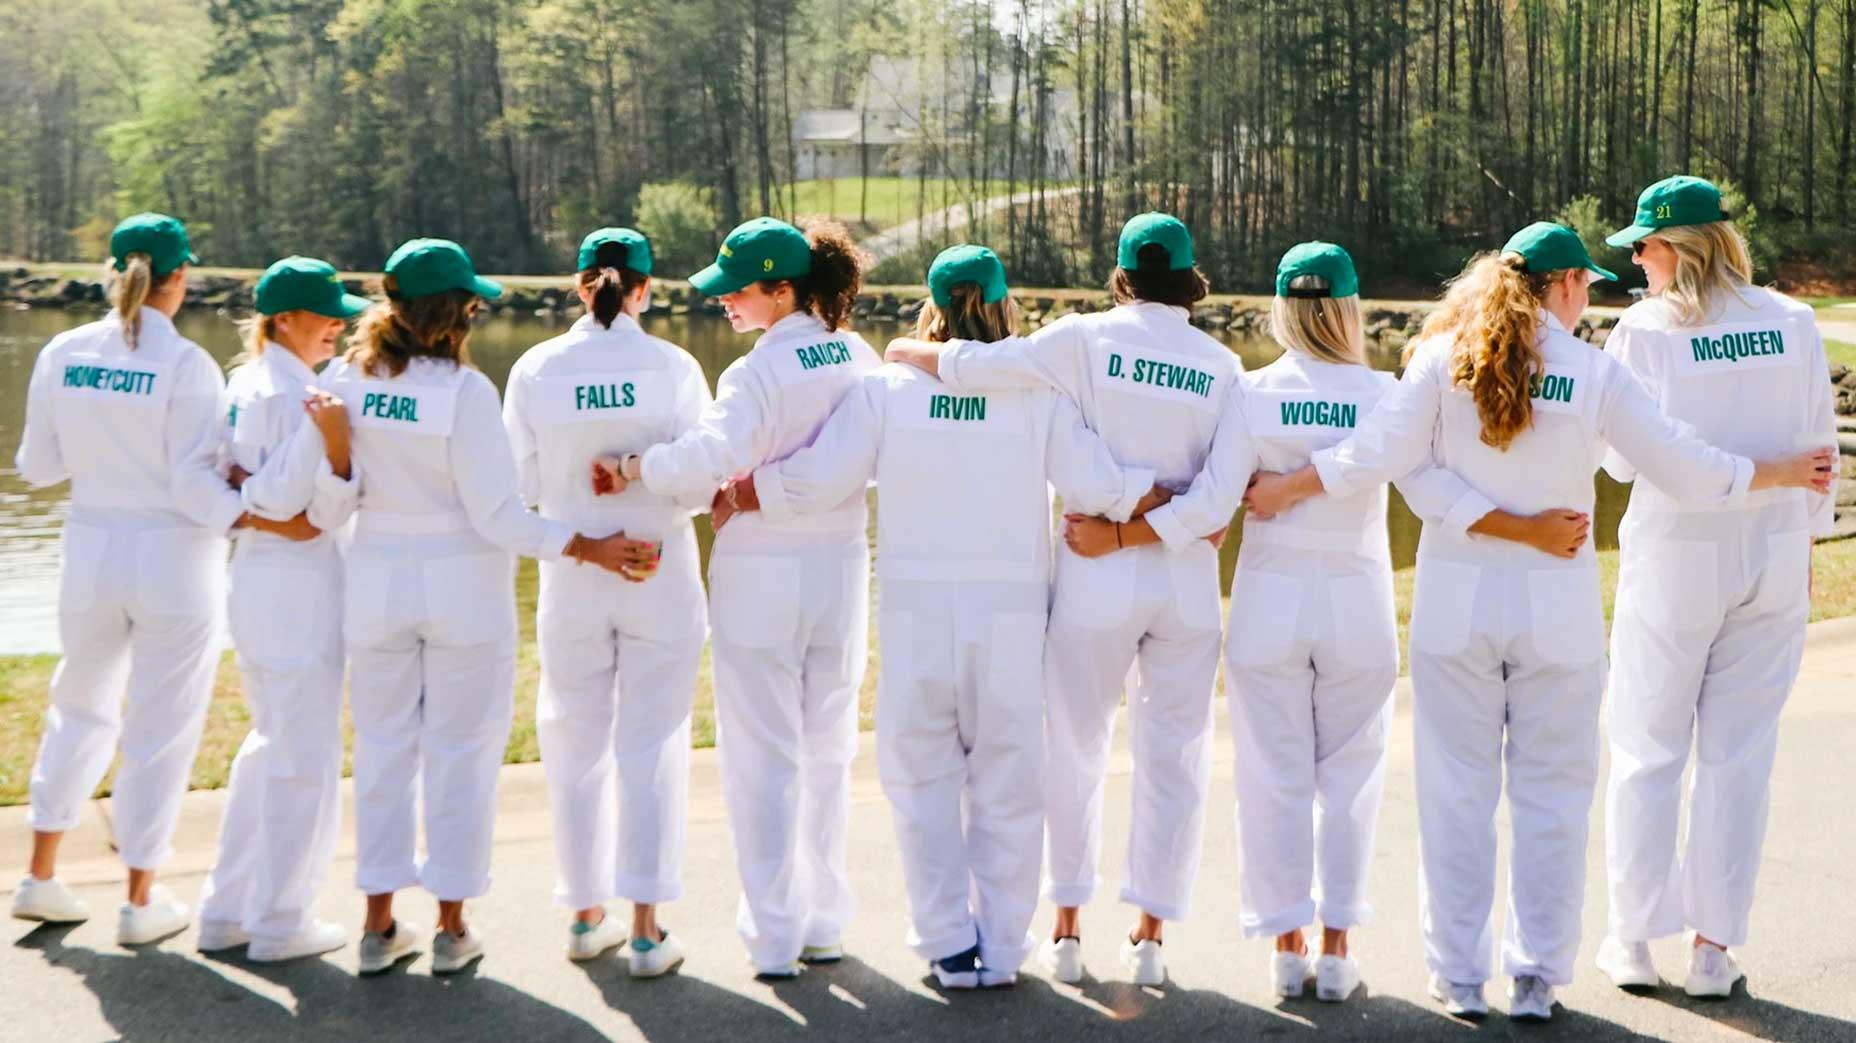 A group of people wearing white caddie bibs